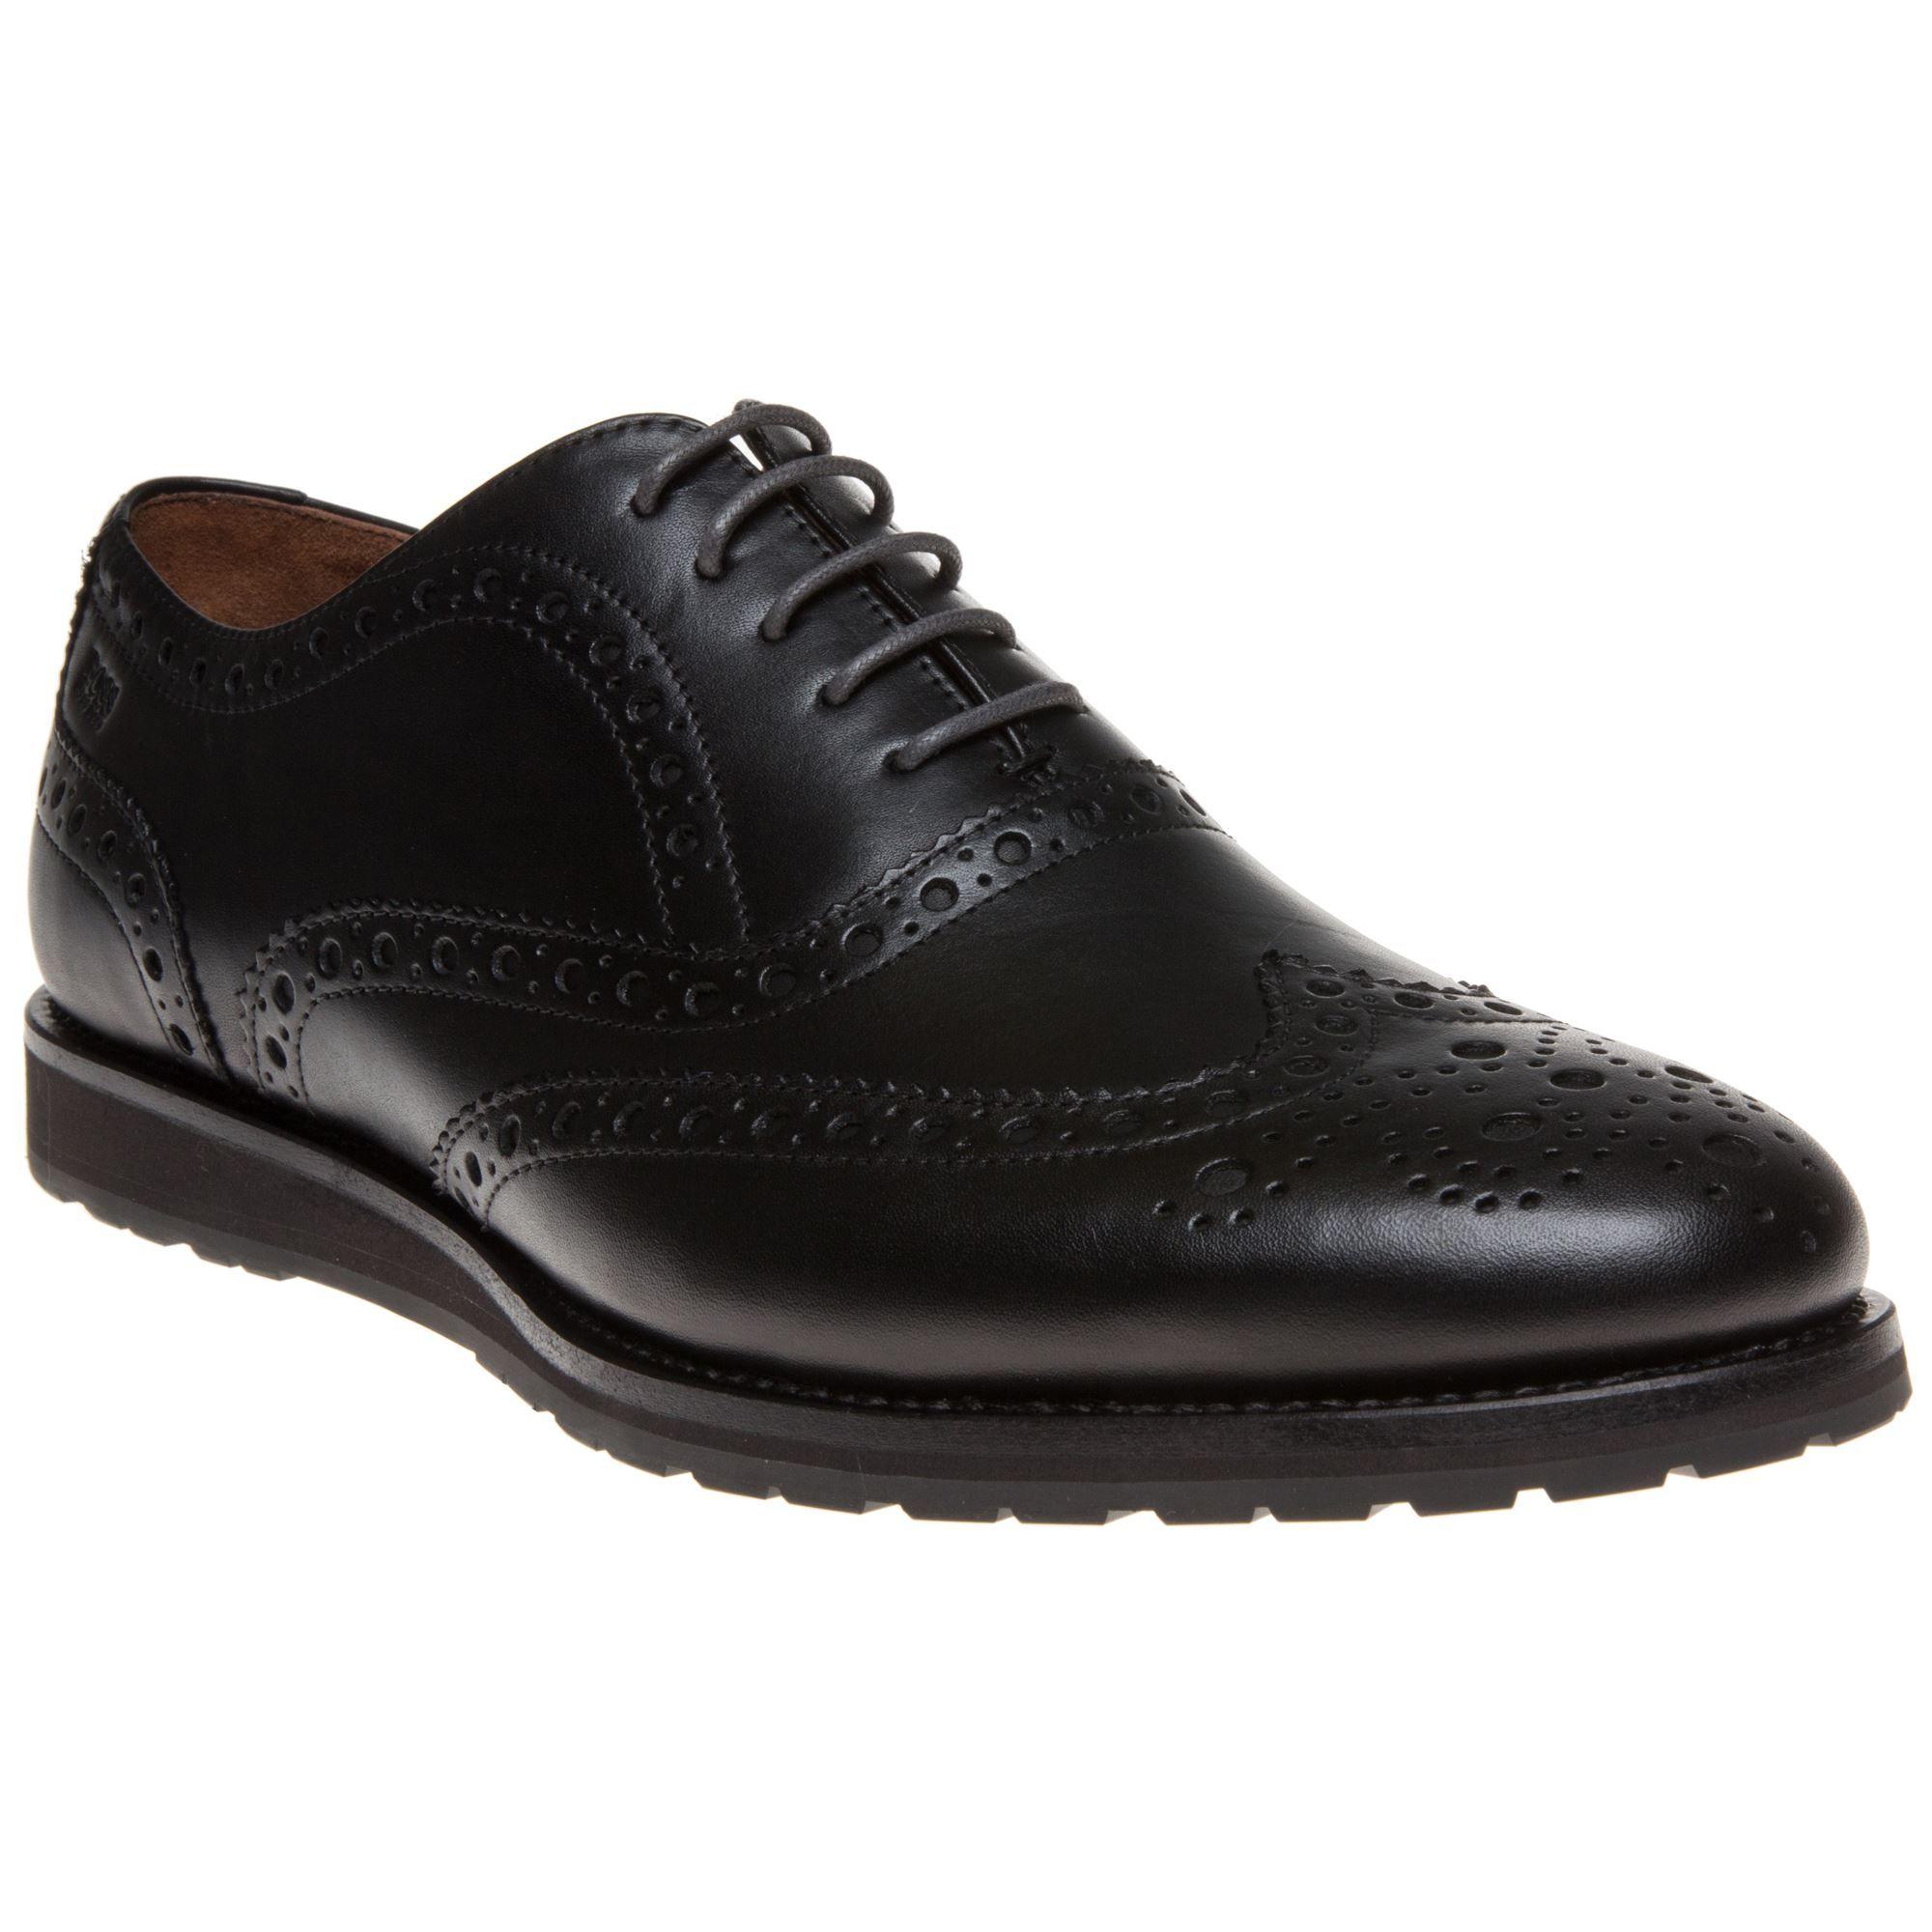 0731bf6666 BOSS Casero Shoes